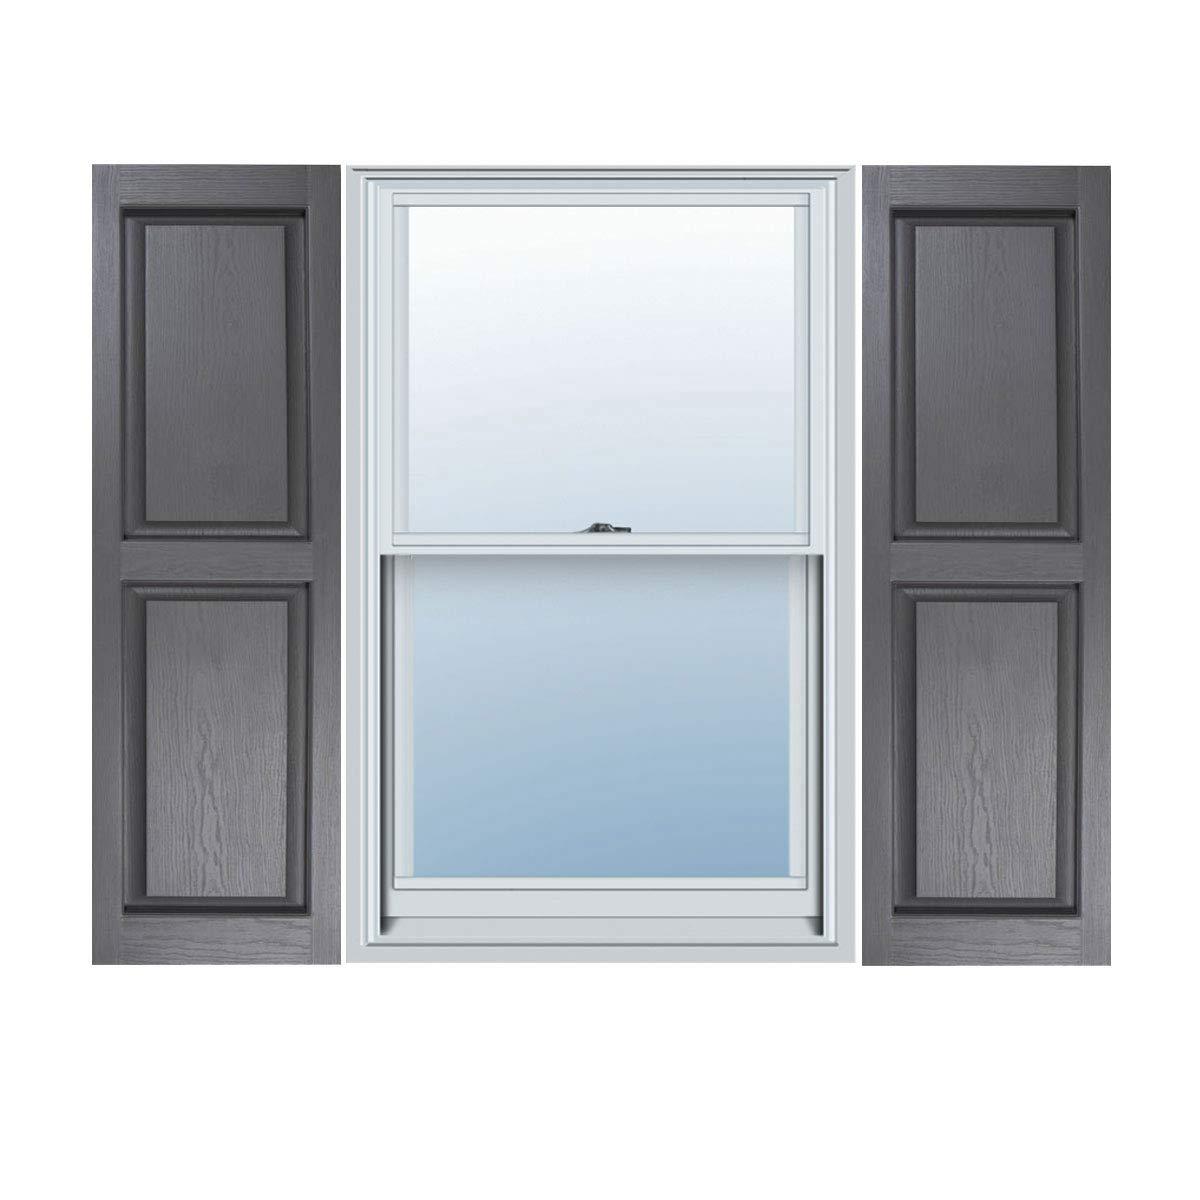 14 1/2'' x 74'' Builders Choice Vinyl Raised Panel Window Shutters, w/Shutter Spikes & Screws (Per Pair), Grey by ArchitecturalDepot.com